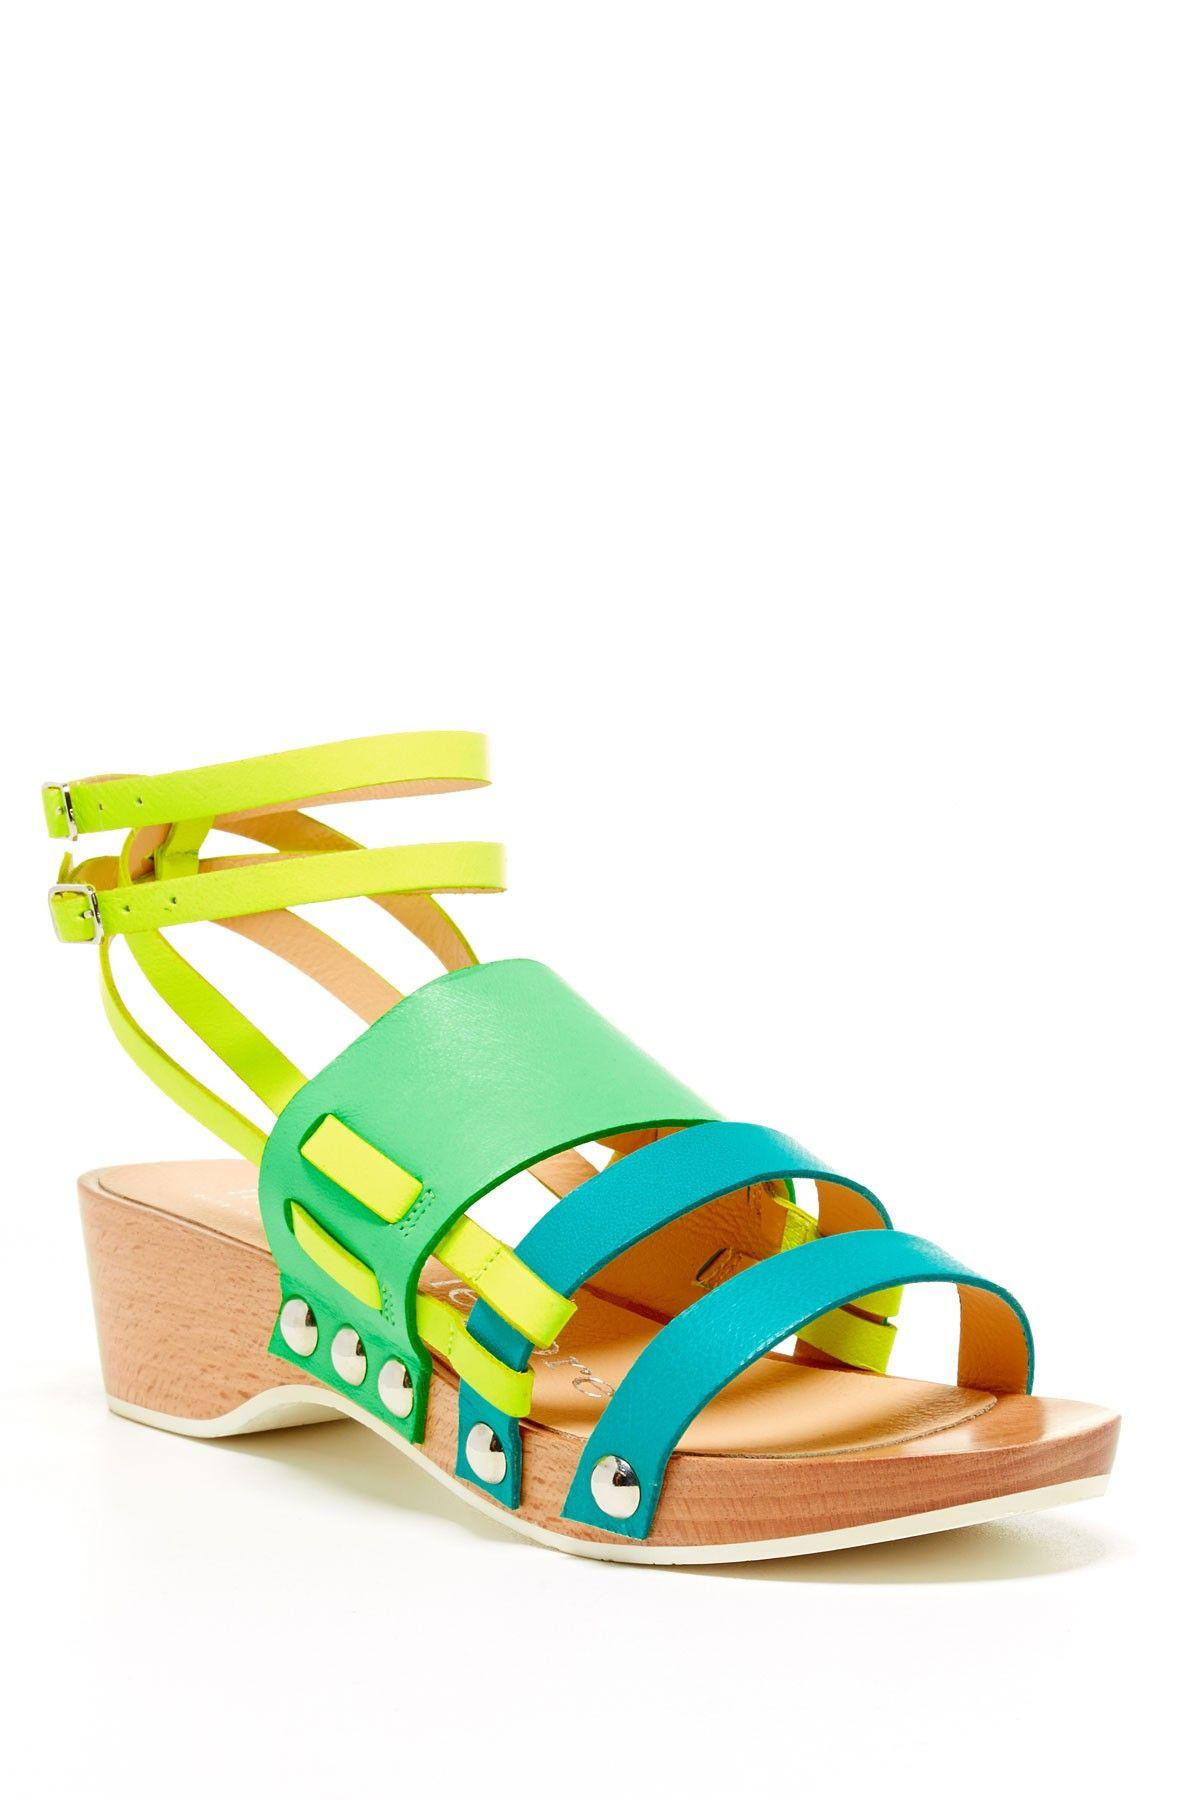 Nanette Lepore Bellini Wedge Sandal Sandals Shoes